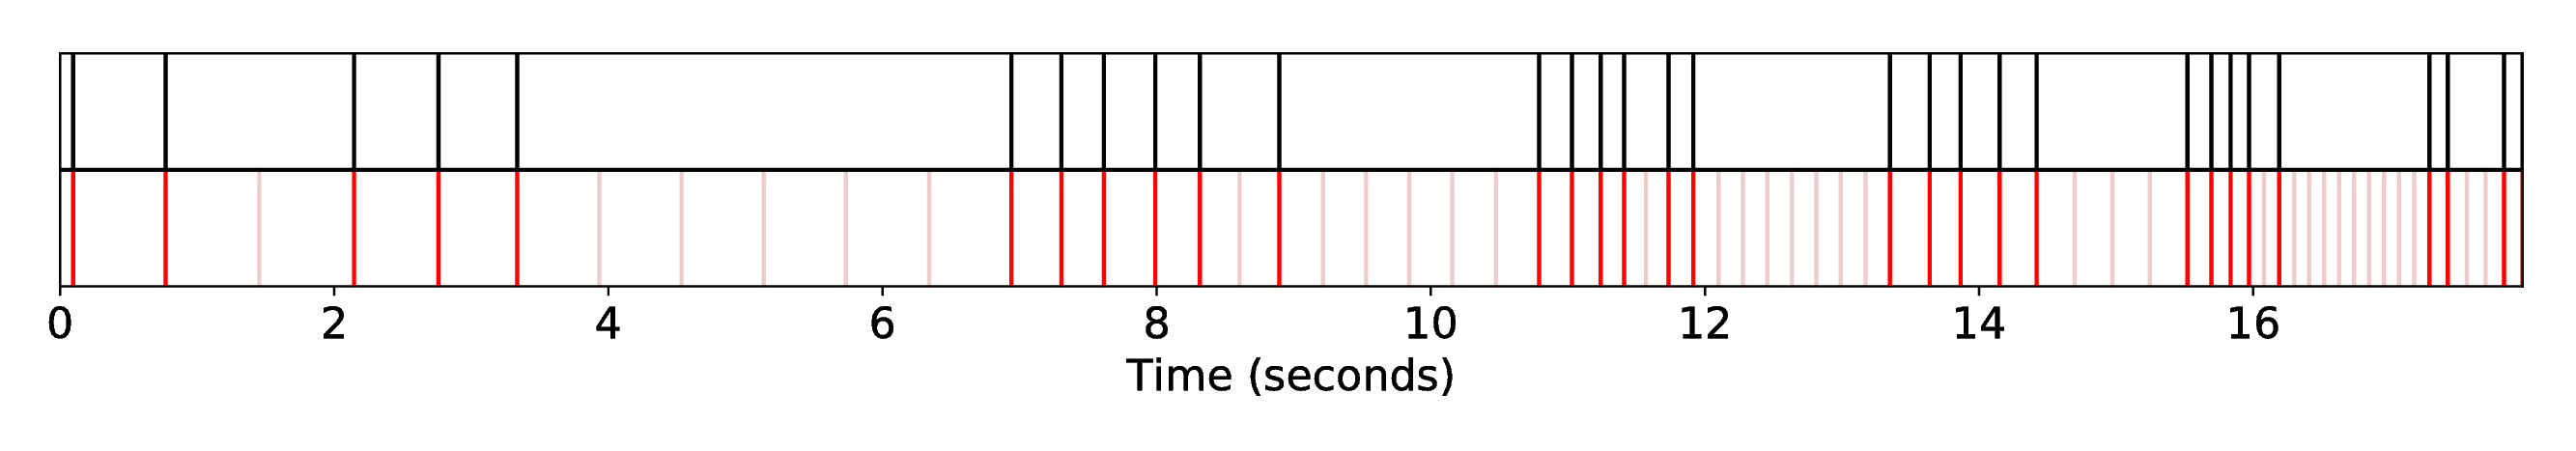 DP1_INT1_R-Syn-InIrGa__S-Broke__SequenceAlignment